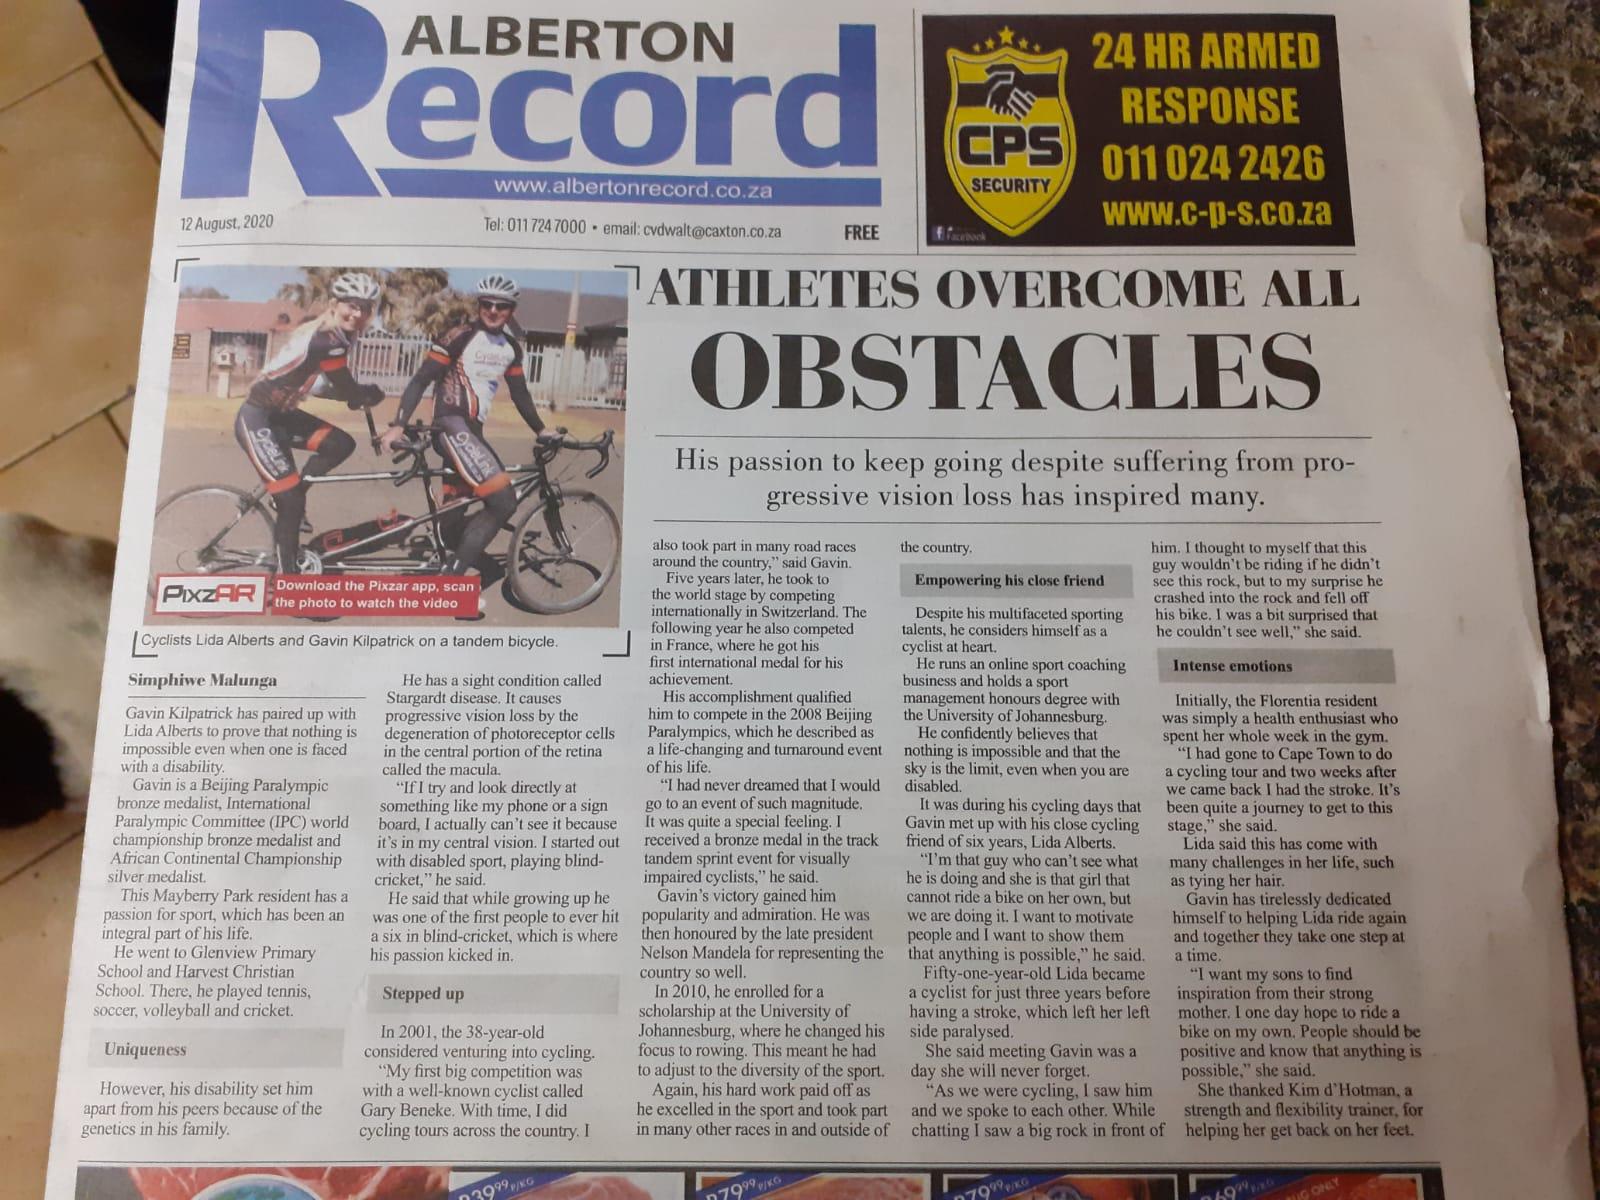 Alberton record Article on Lida Alberts Return to Cycling